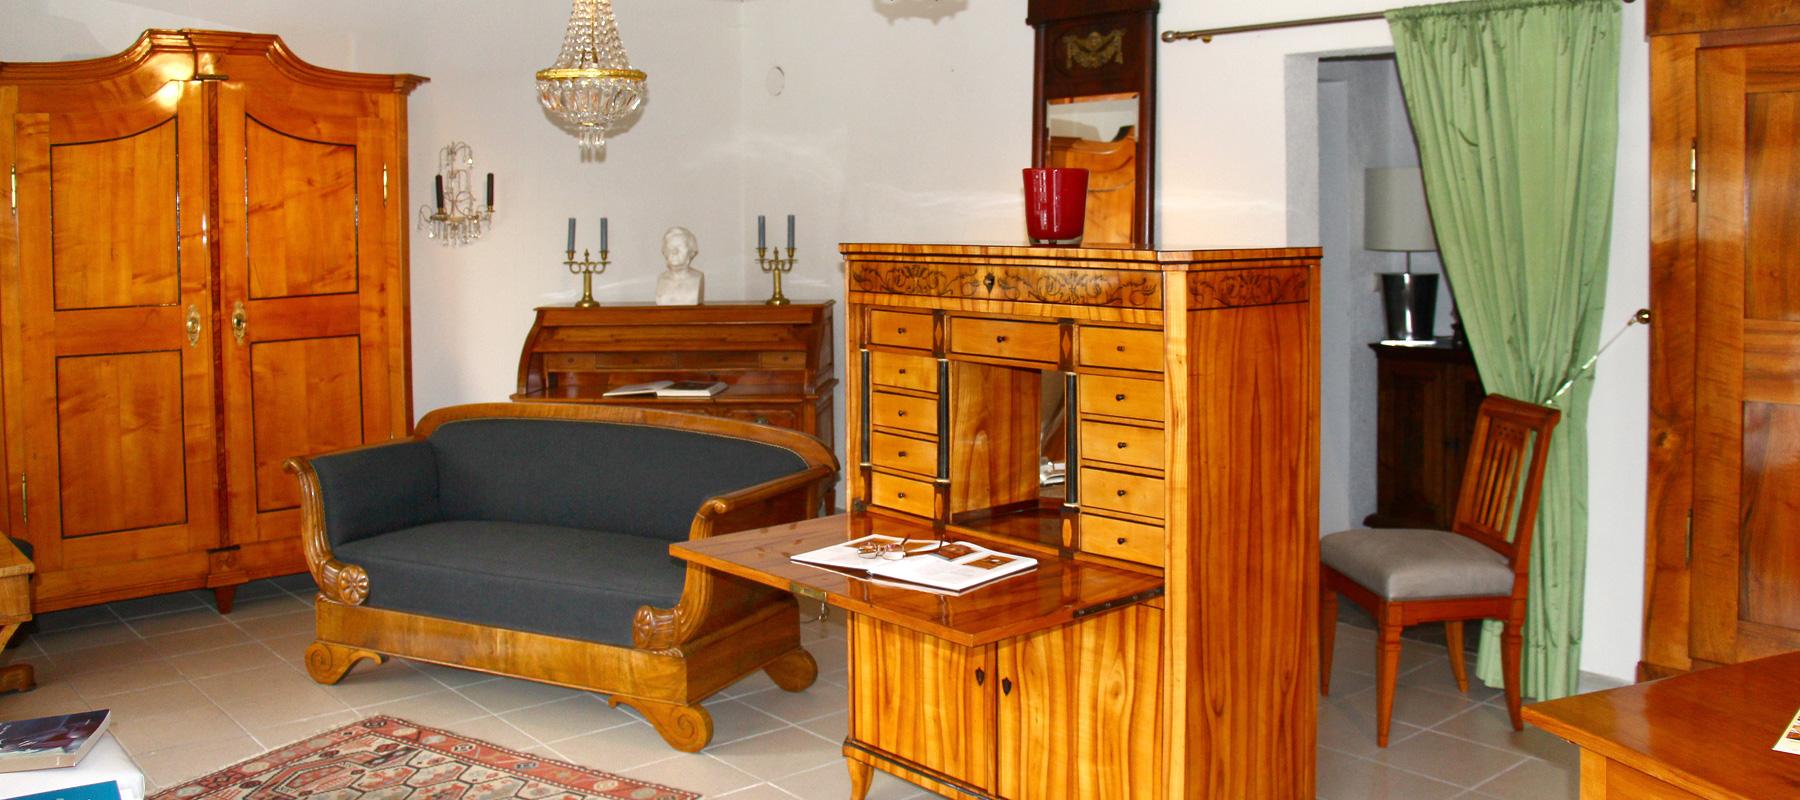 Antik Stumpf Neckarsteinach Antike Möbel Barockschränke Louis